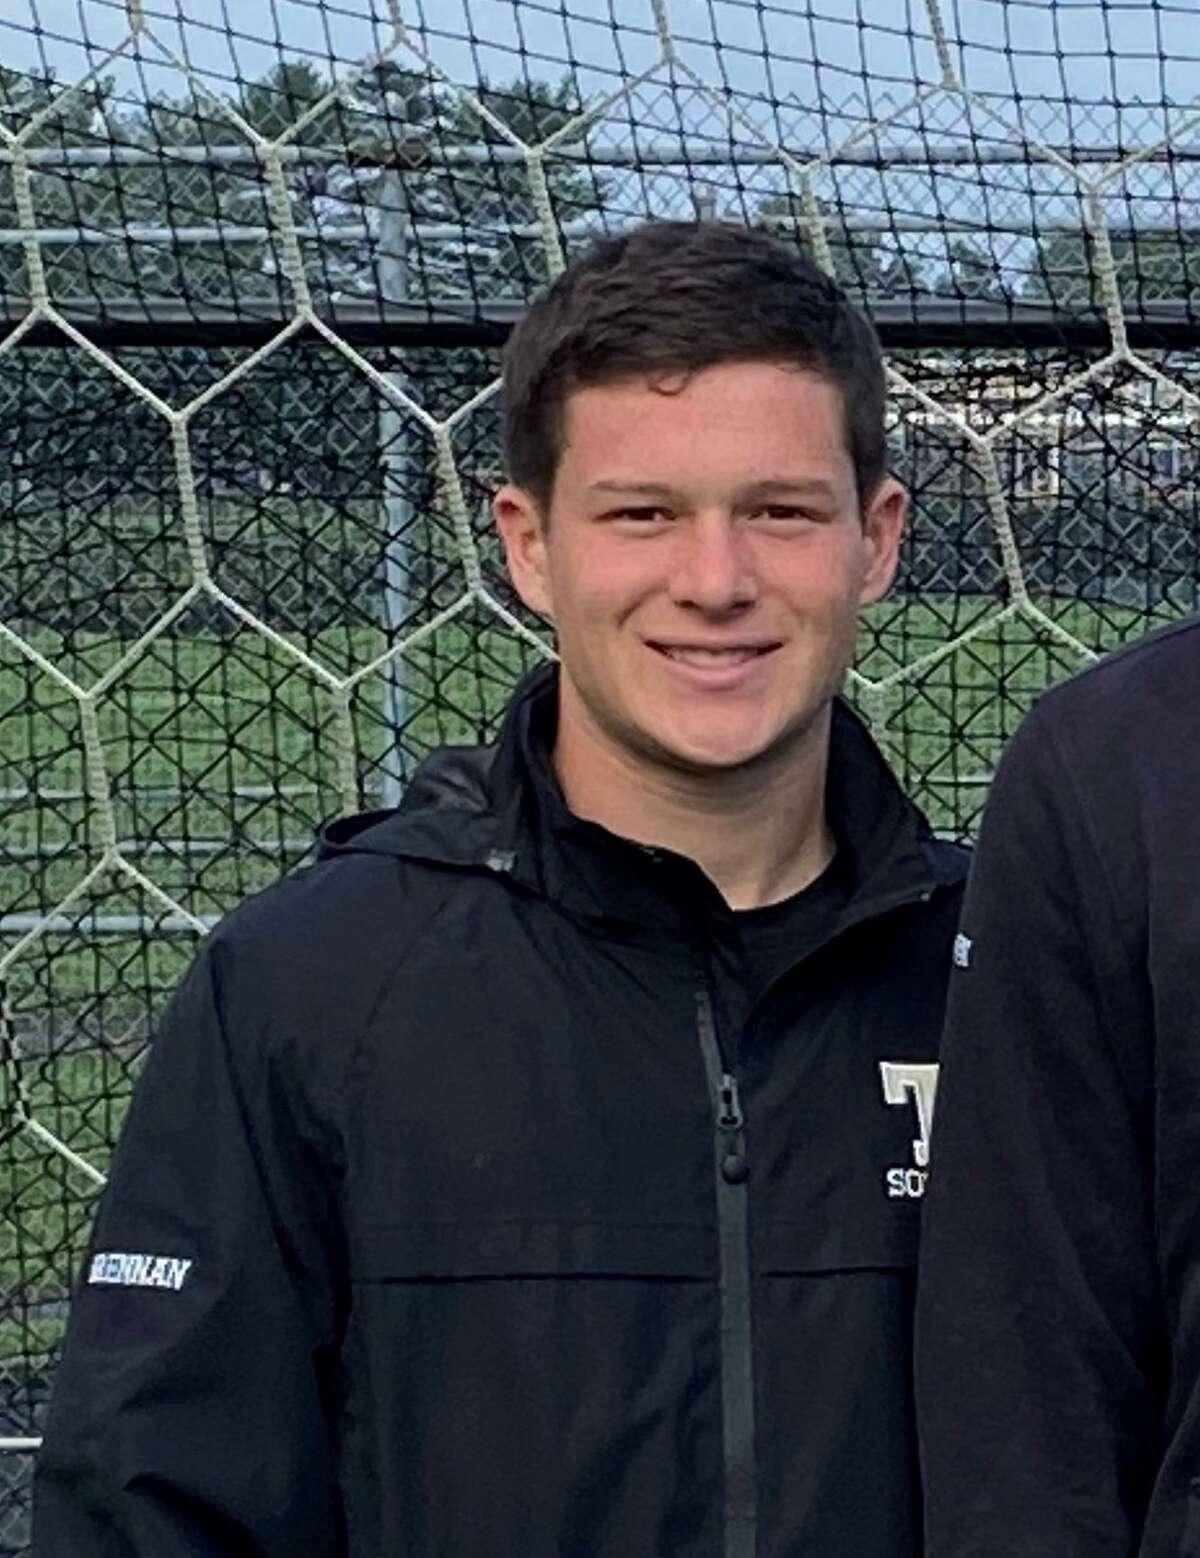 Sean Brennan, Alexander Conaway, Phillip Pires are Trumbull boys' soccer team captains.